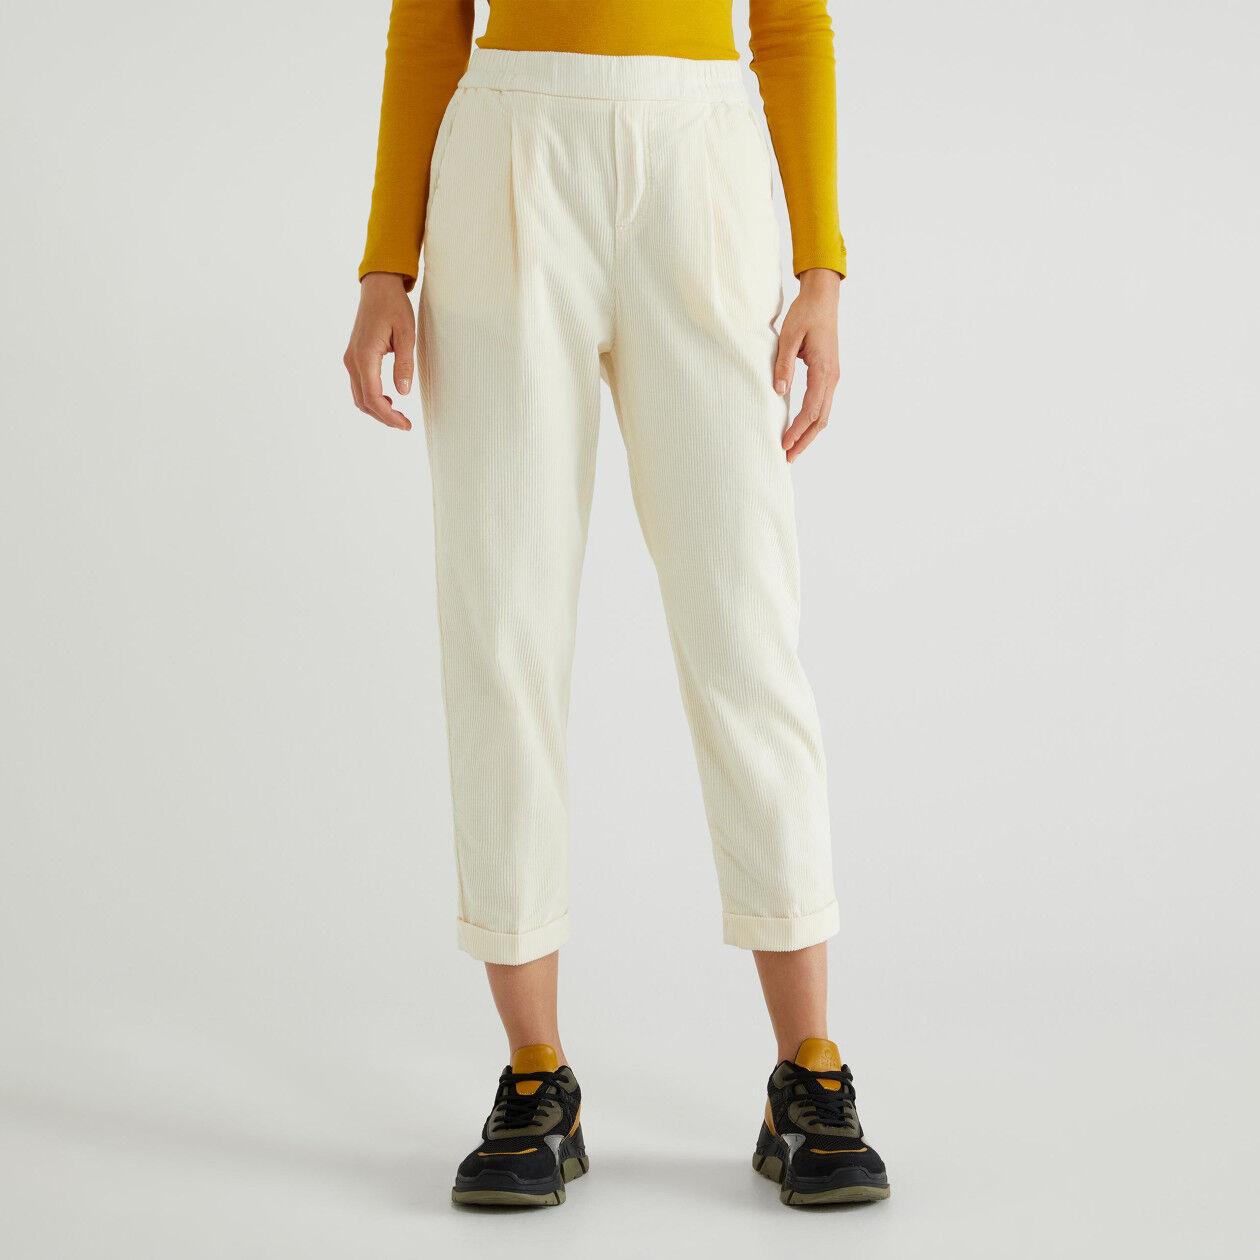 Pantalones chinos de pana con vuelta